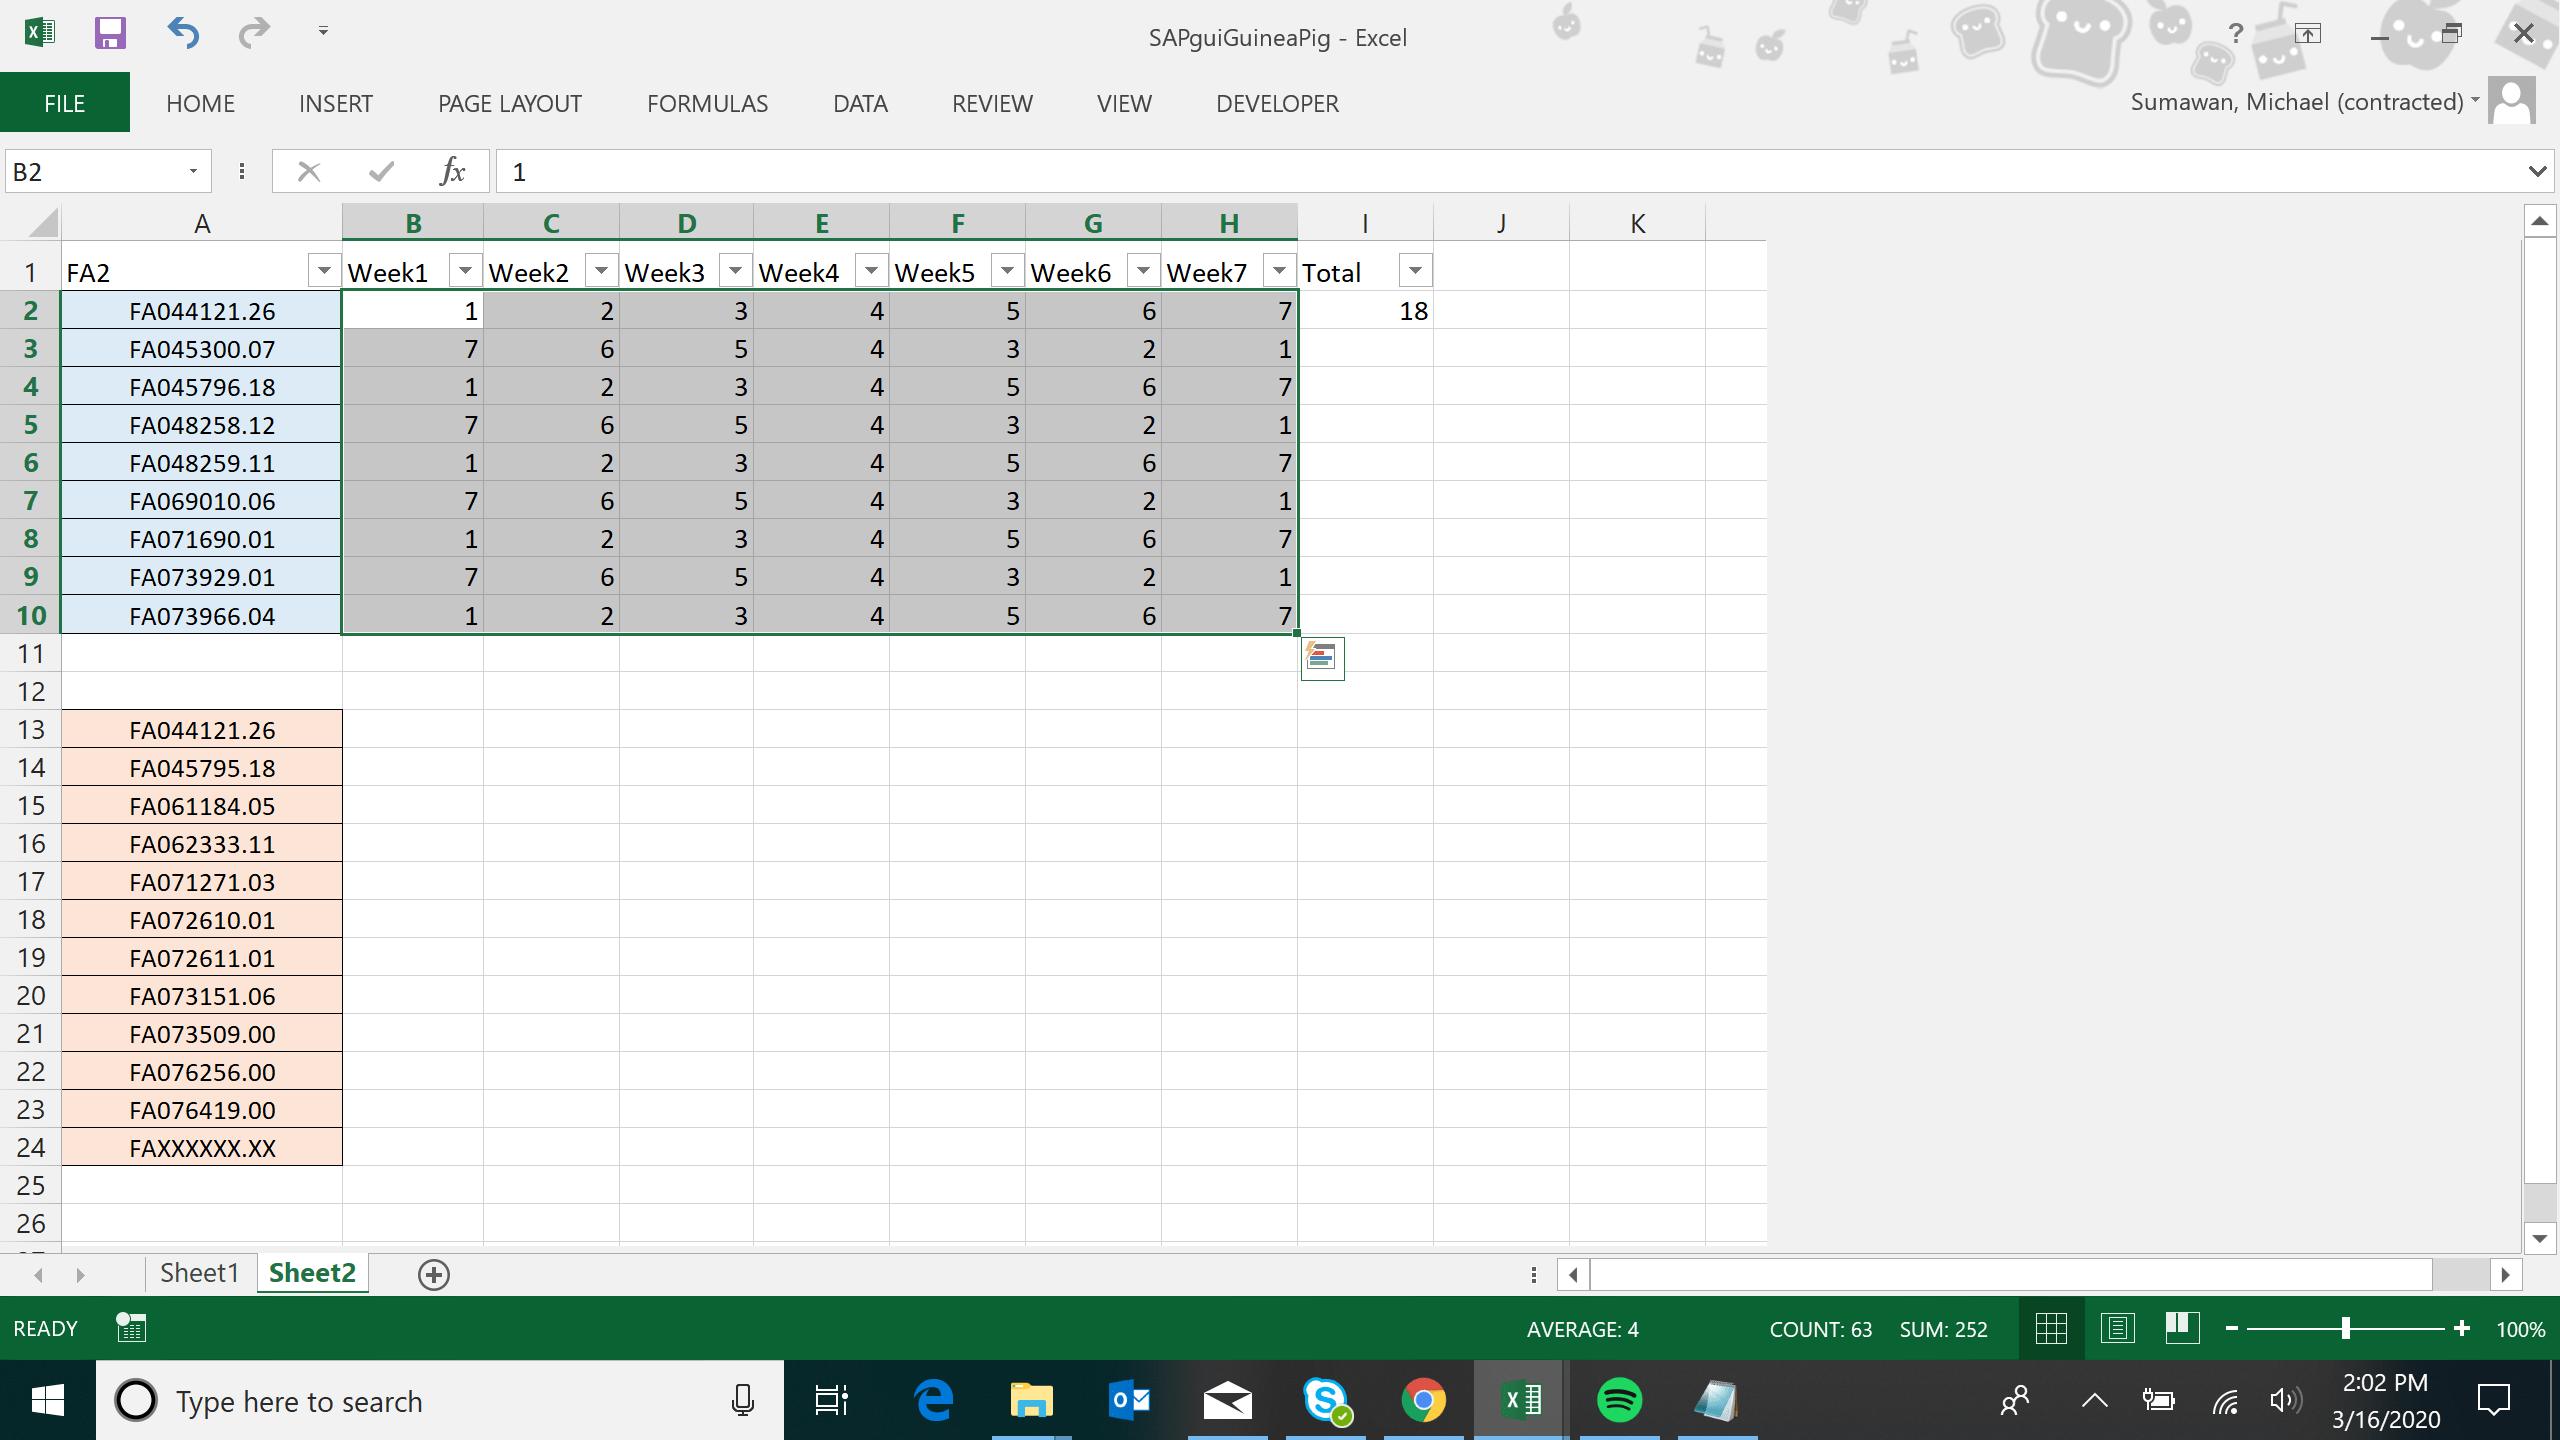 How Do I Code Shift Left Arrow Key In Vba Excel To